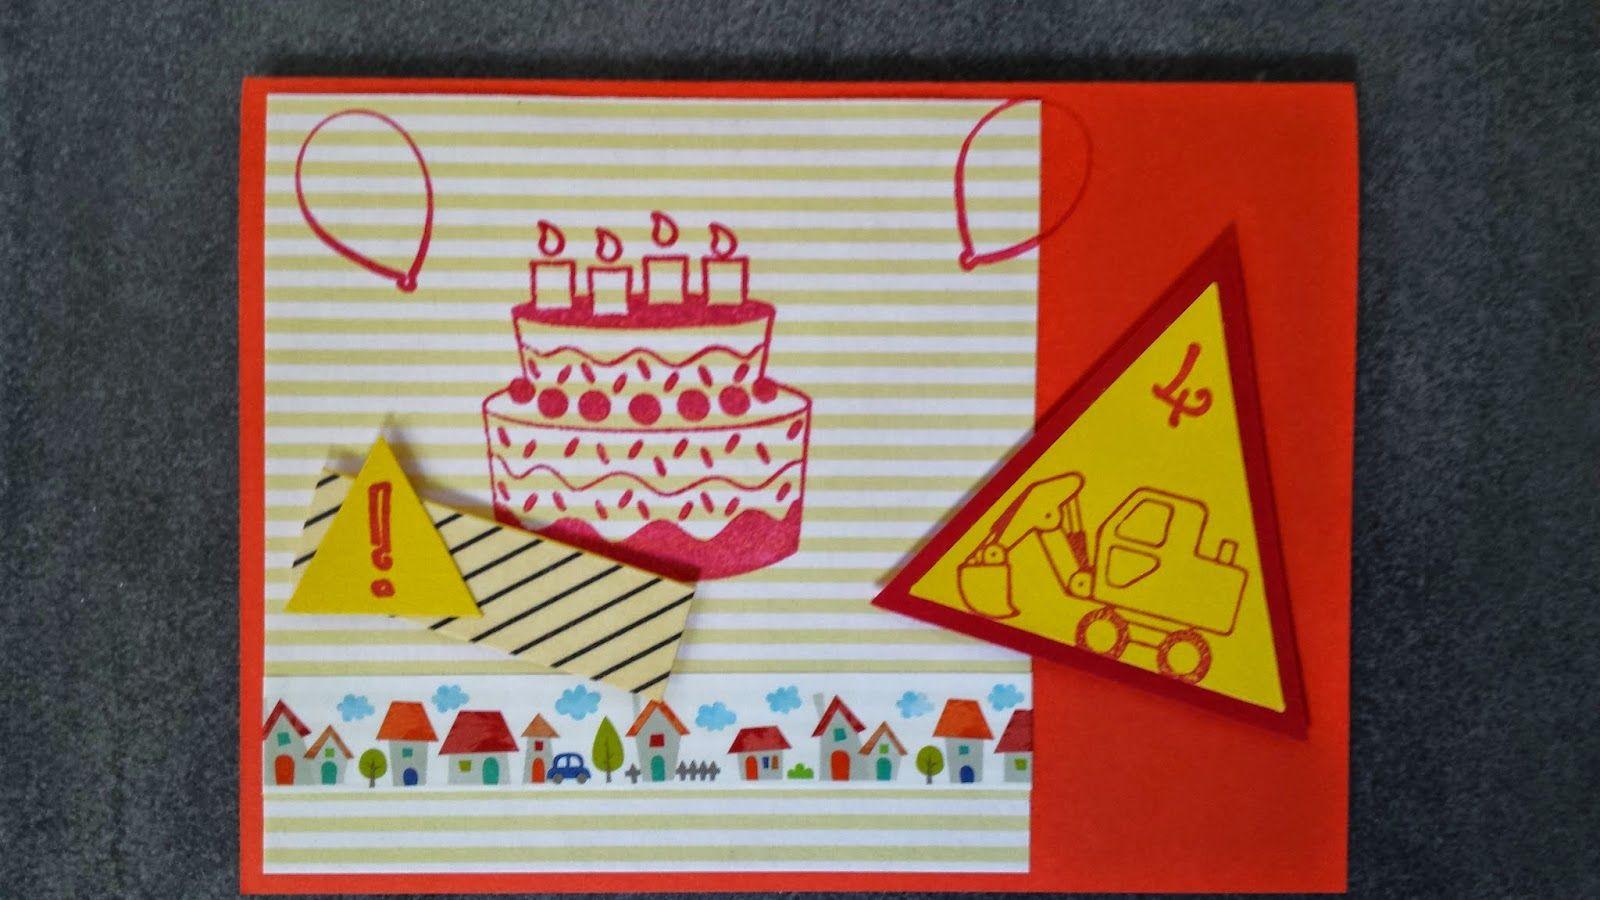 invitation d 39 anniversaire th me chantier birthday party. Black Bedroom Furniture Sets. Home Design Ideas